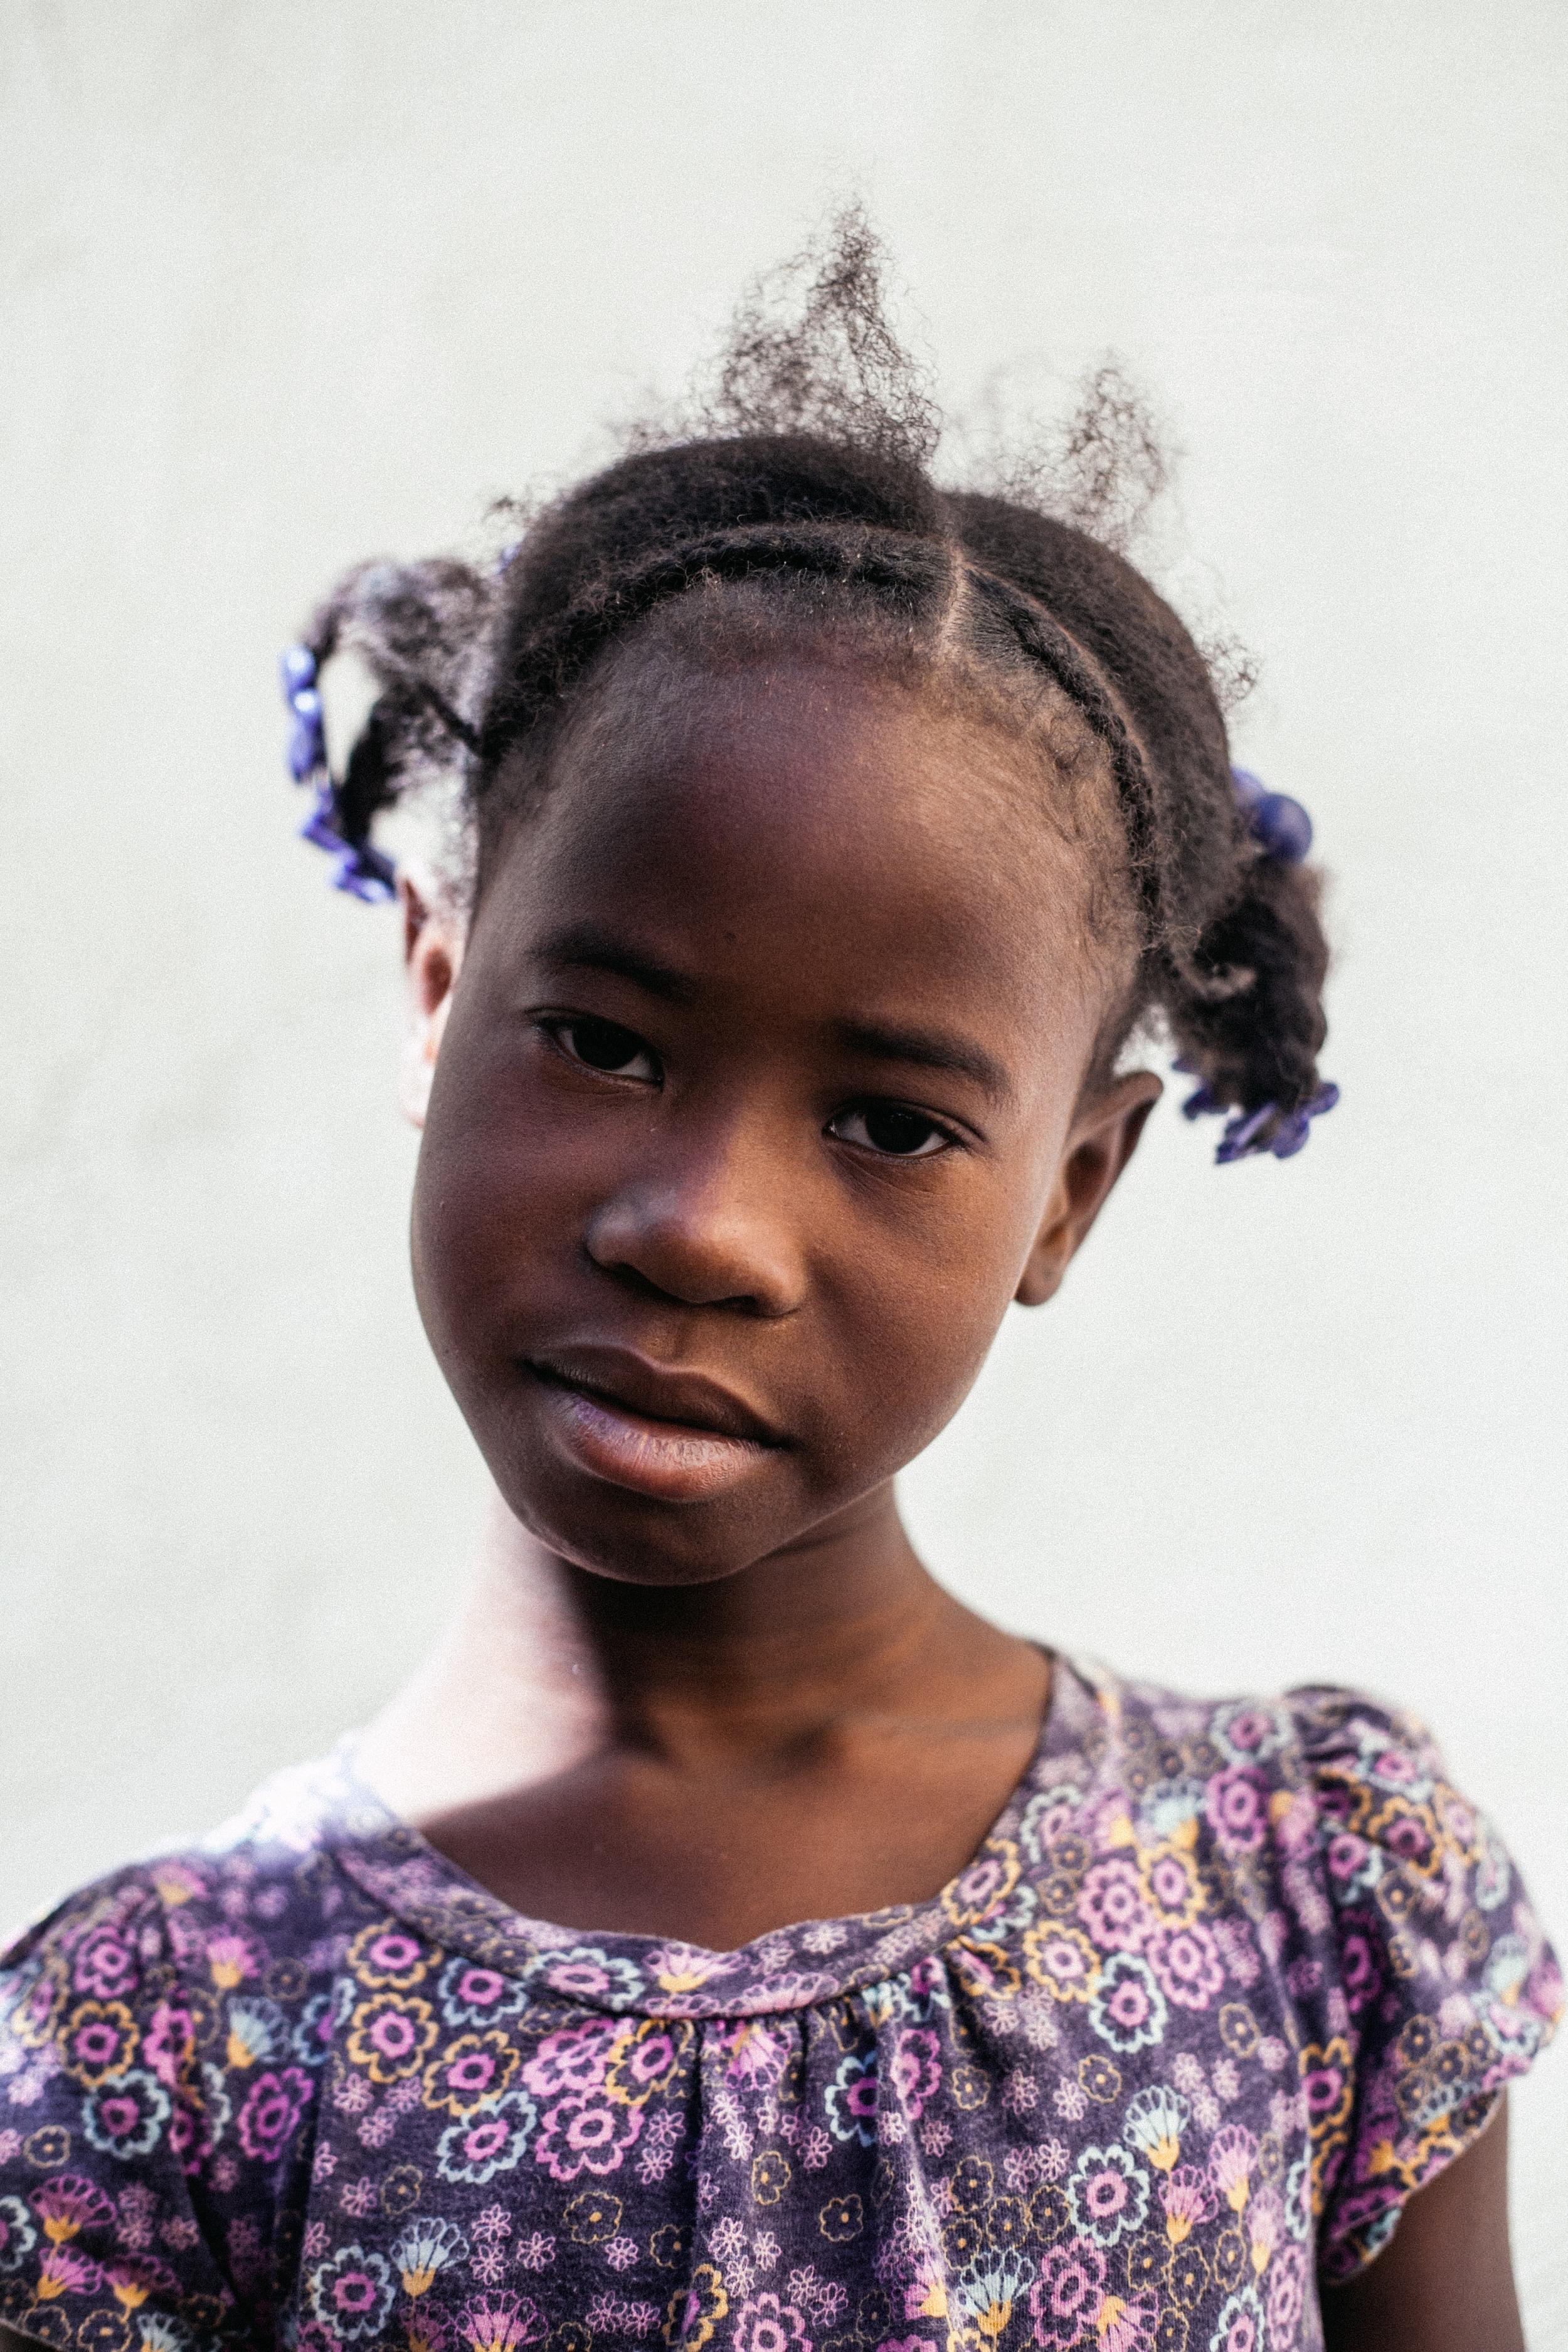 Haiti5starslores152.jpg